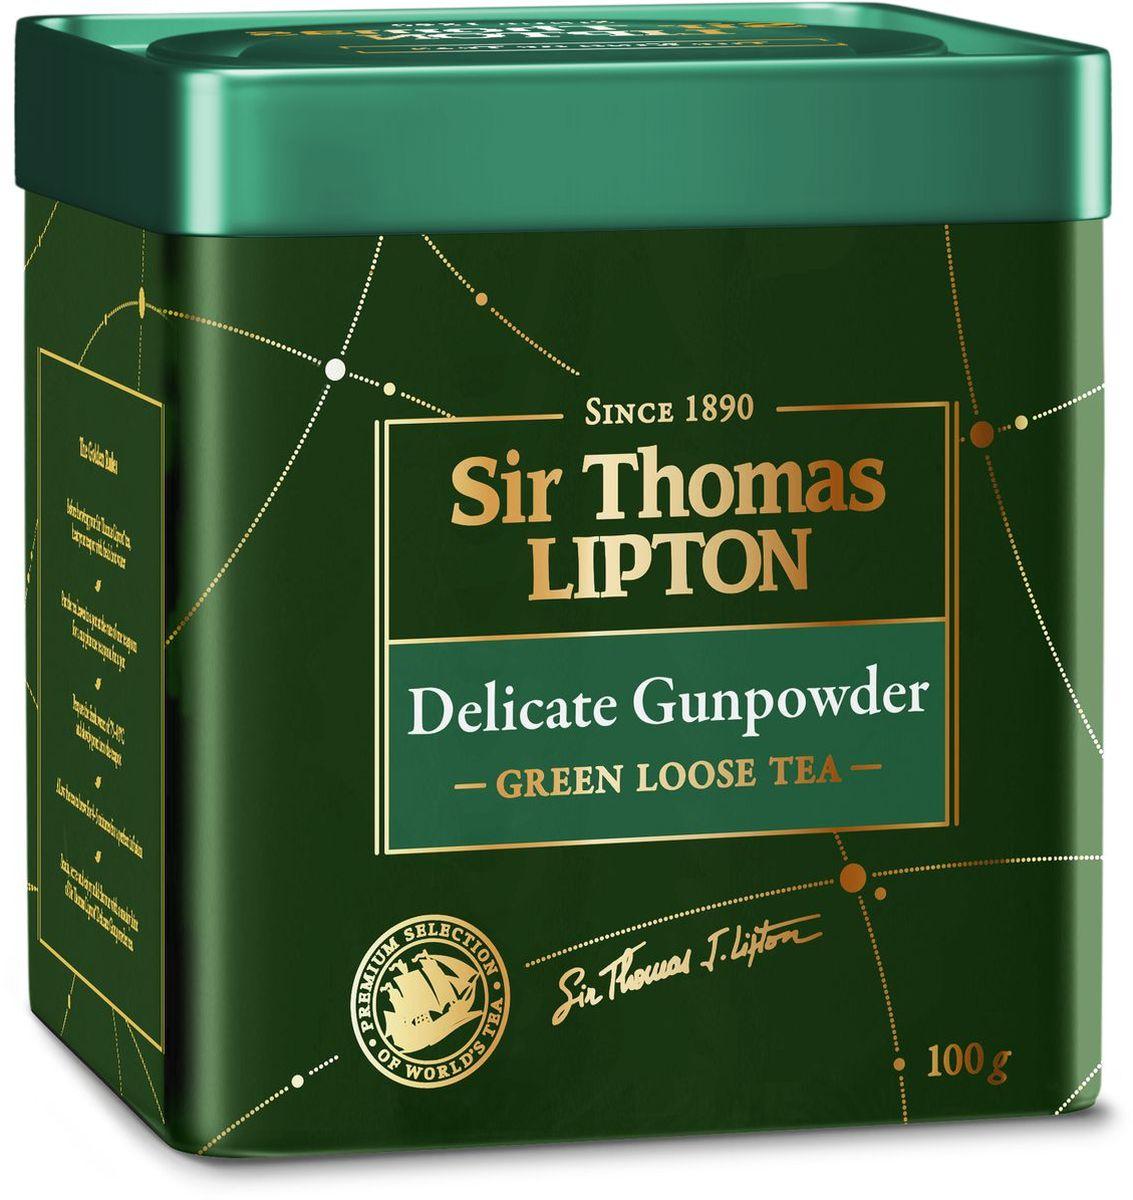 Sir Thomas Lipton Delicate Gunpowder чай зеленый листовой, 100 г листовой желатин 22 гр